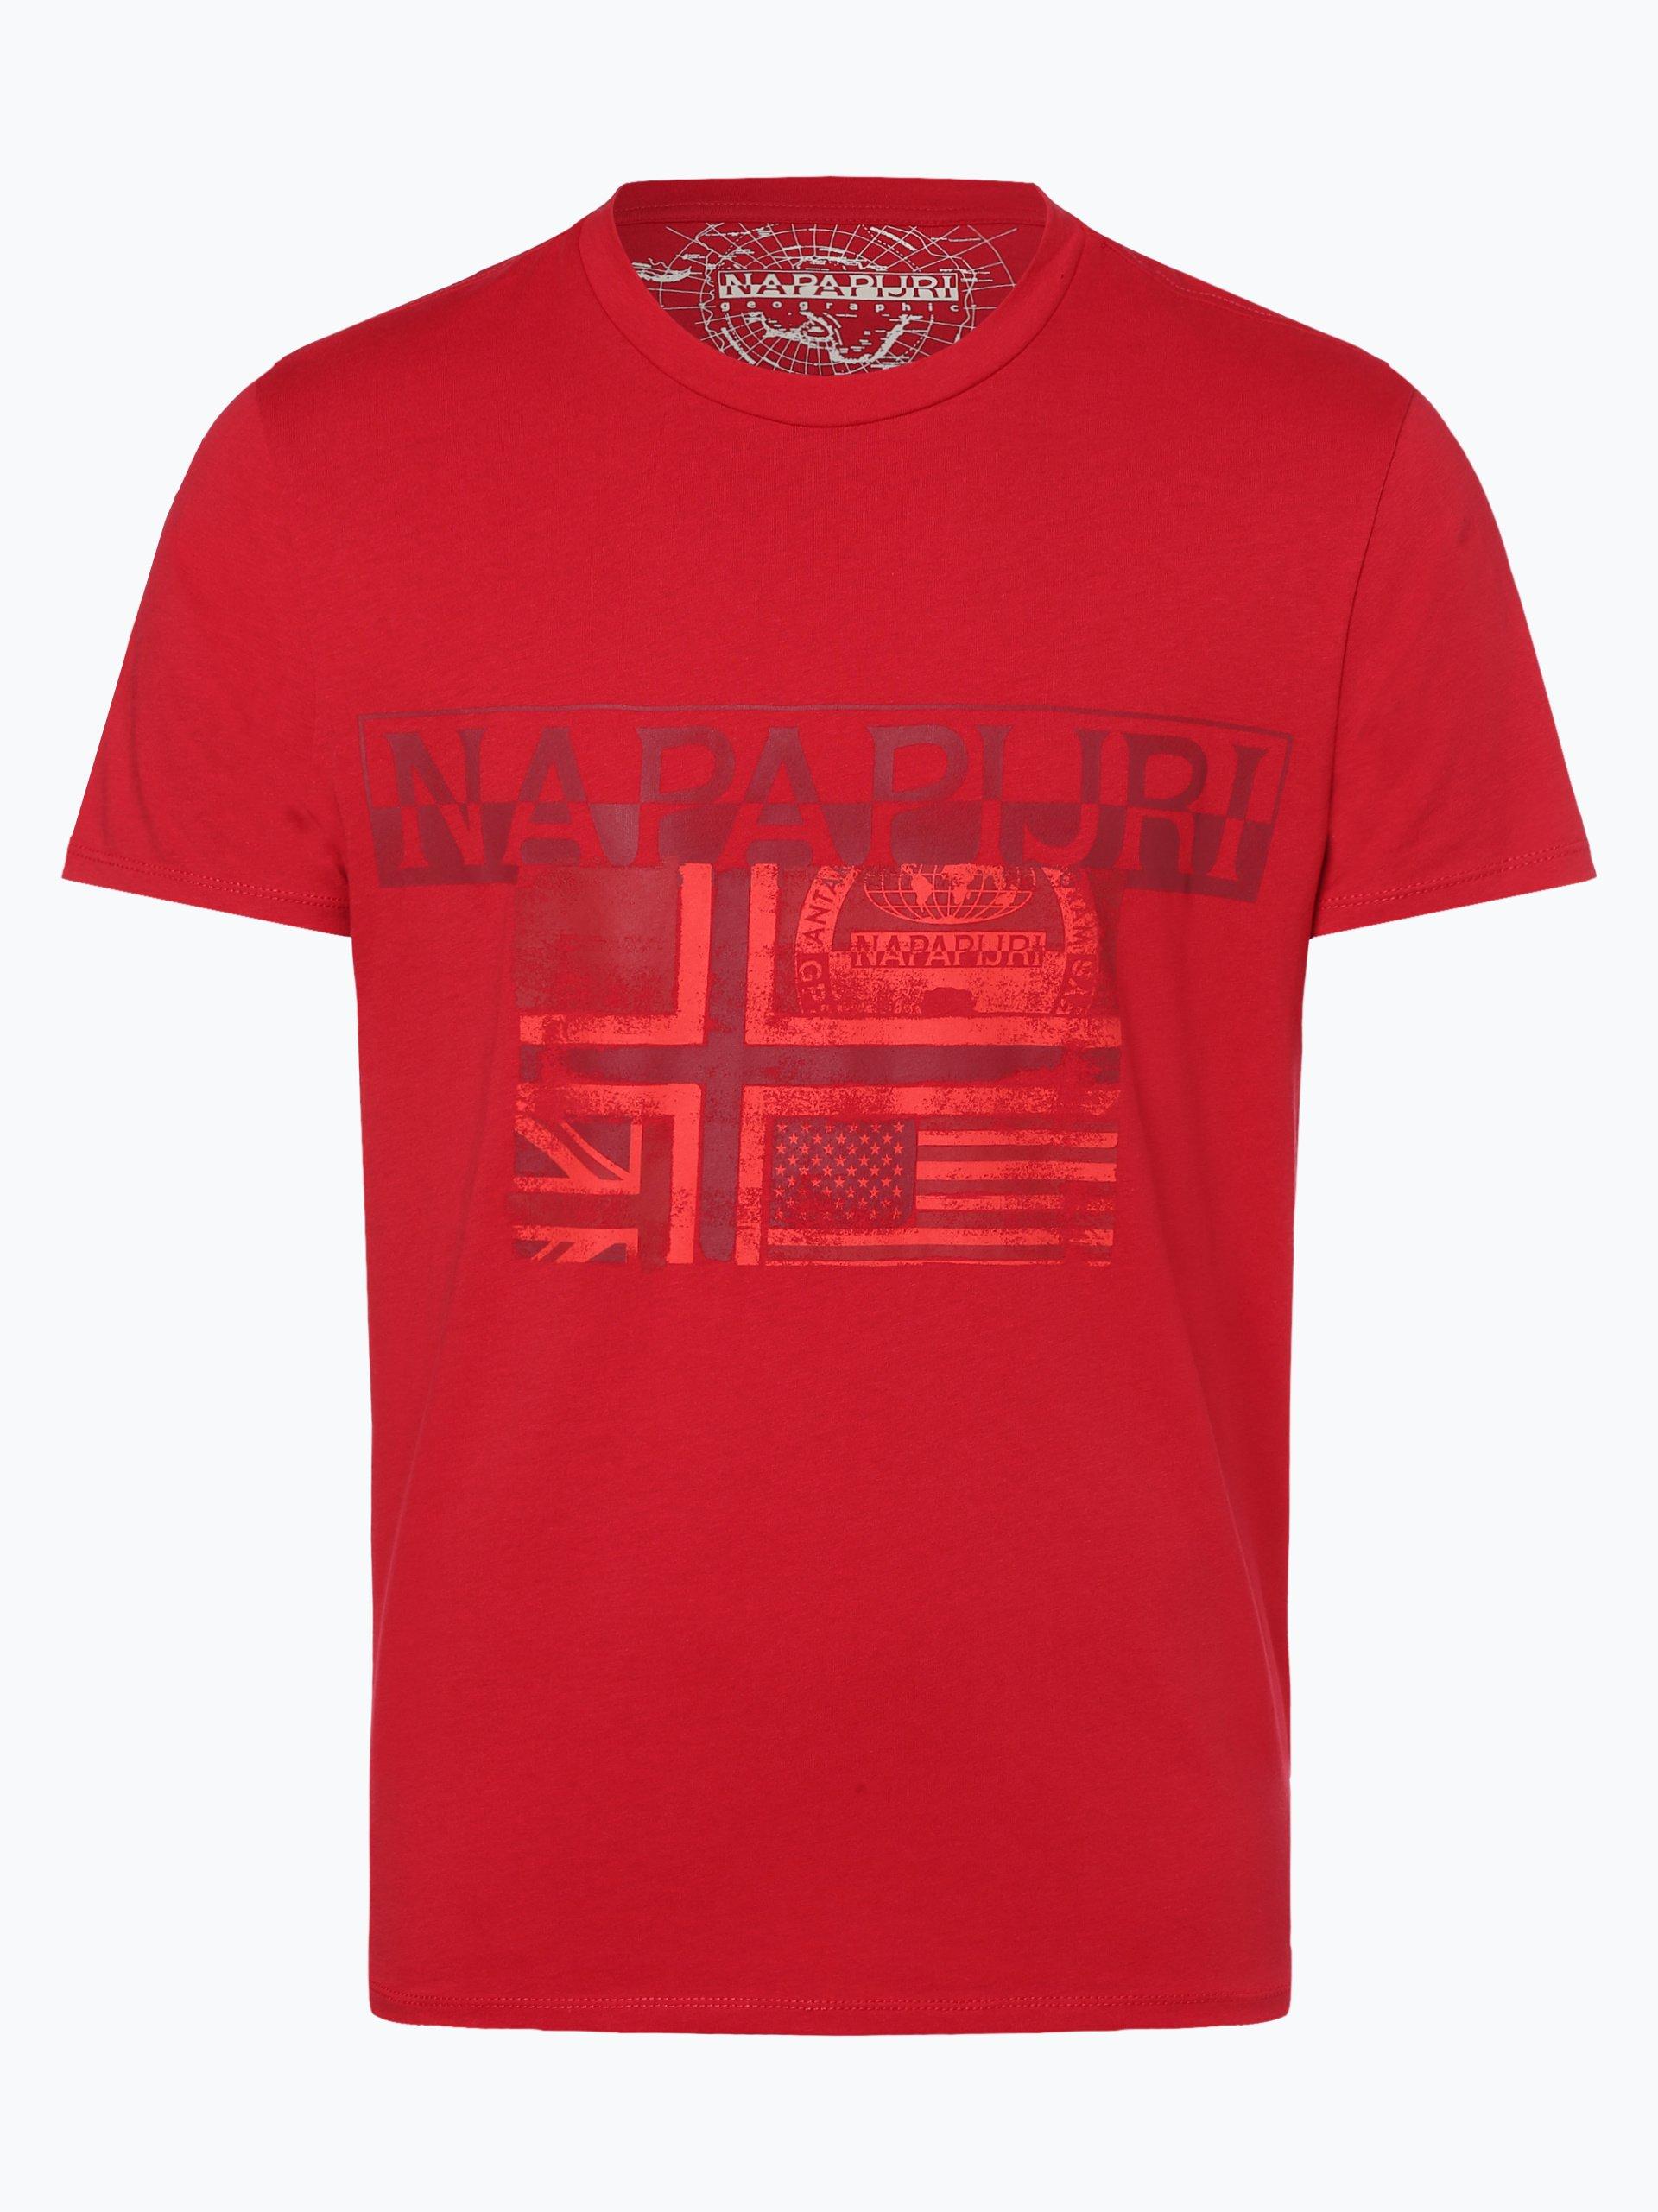 Napapijri T-shirt męski